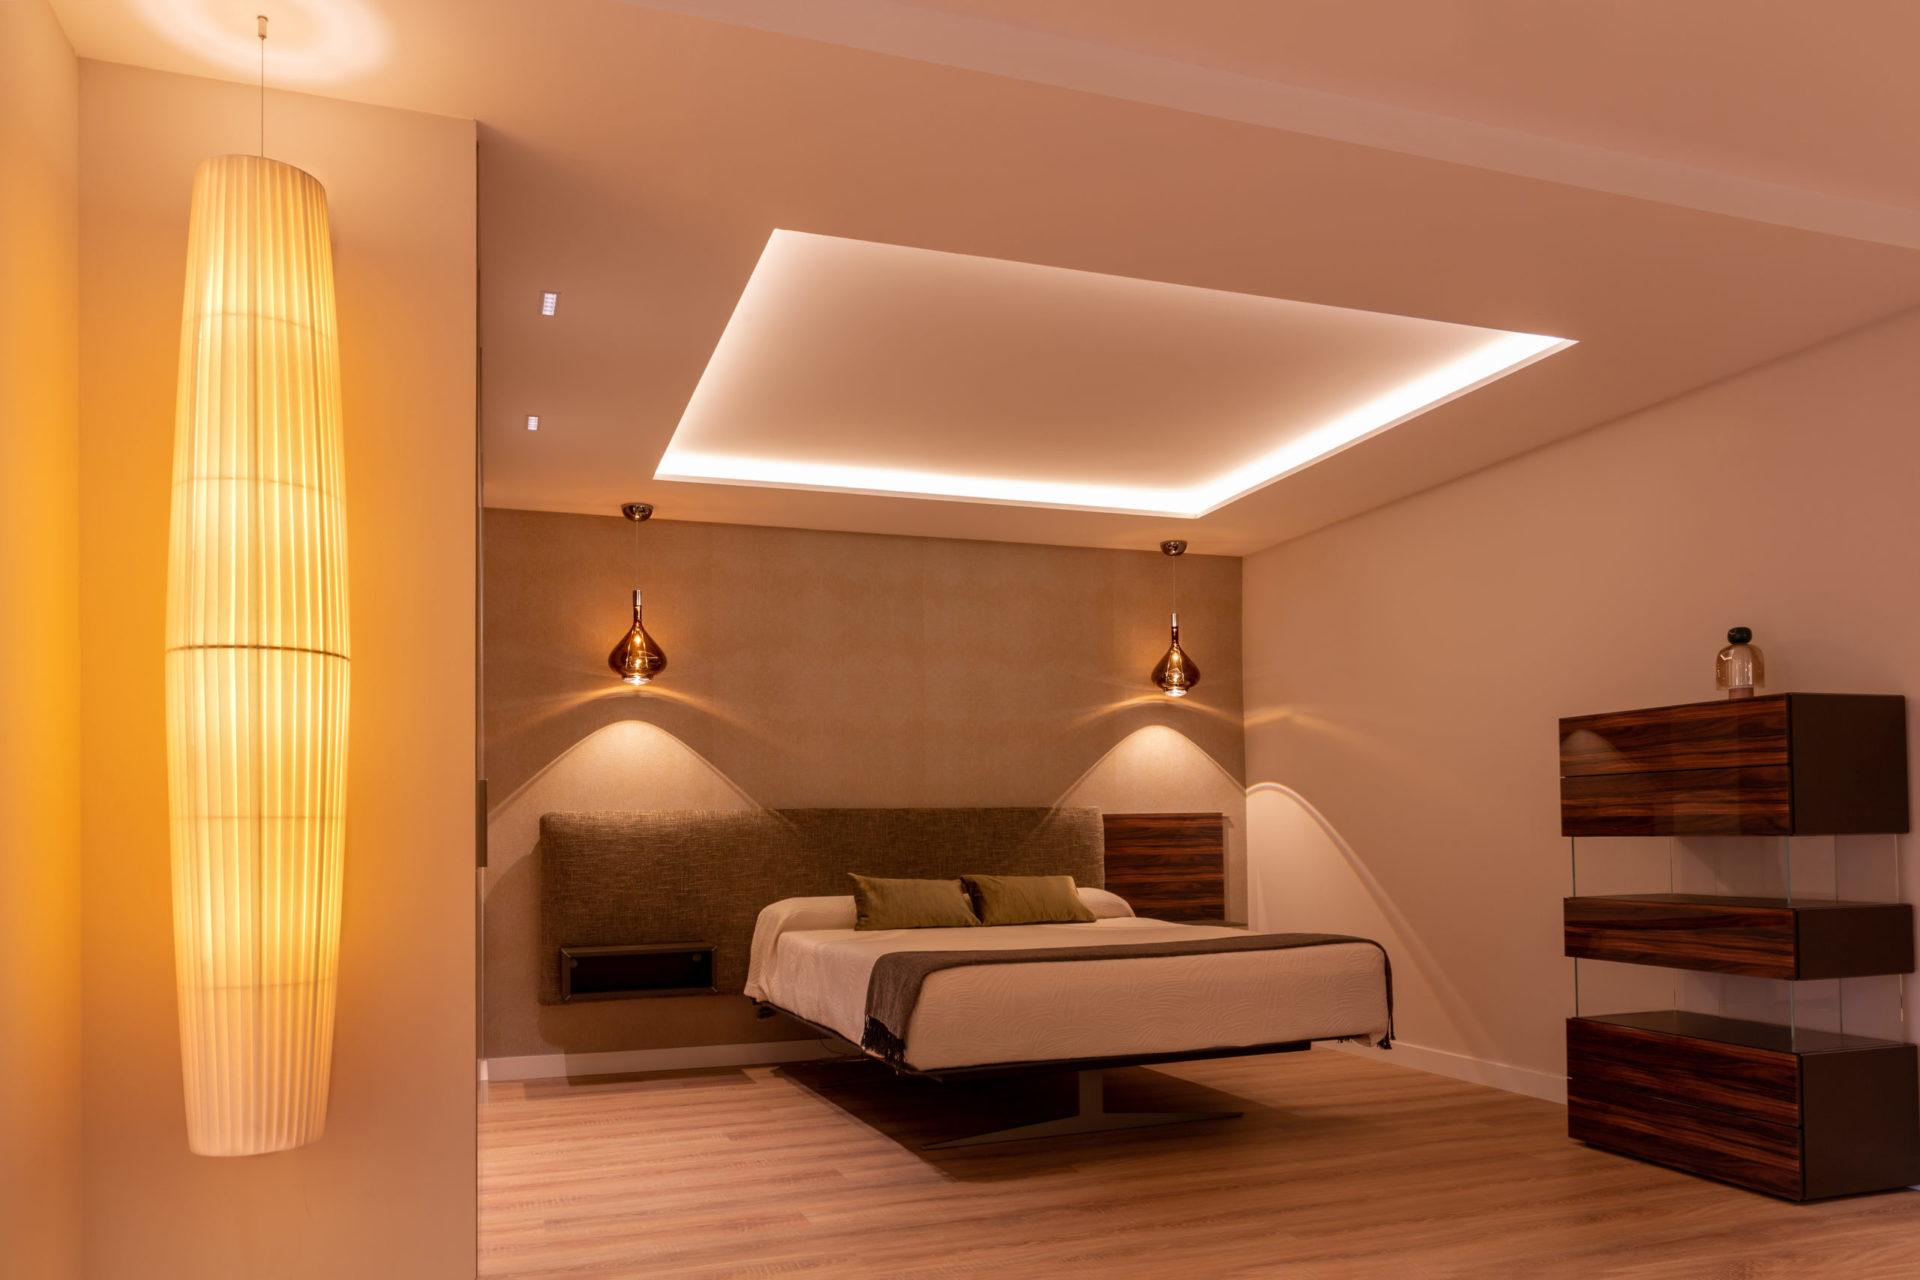 Proyectos de iluminación interiores